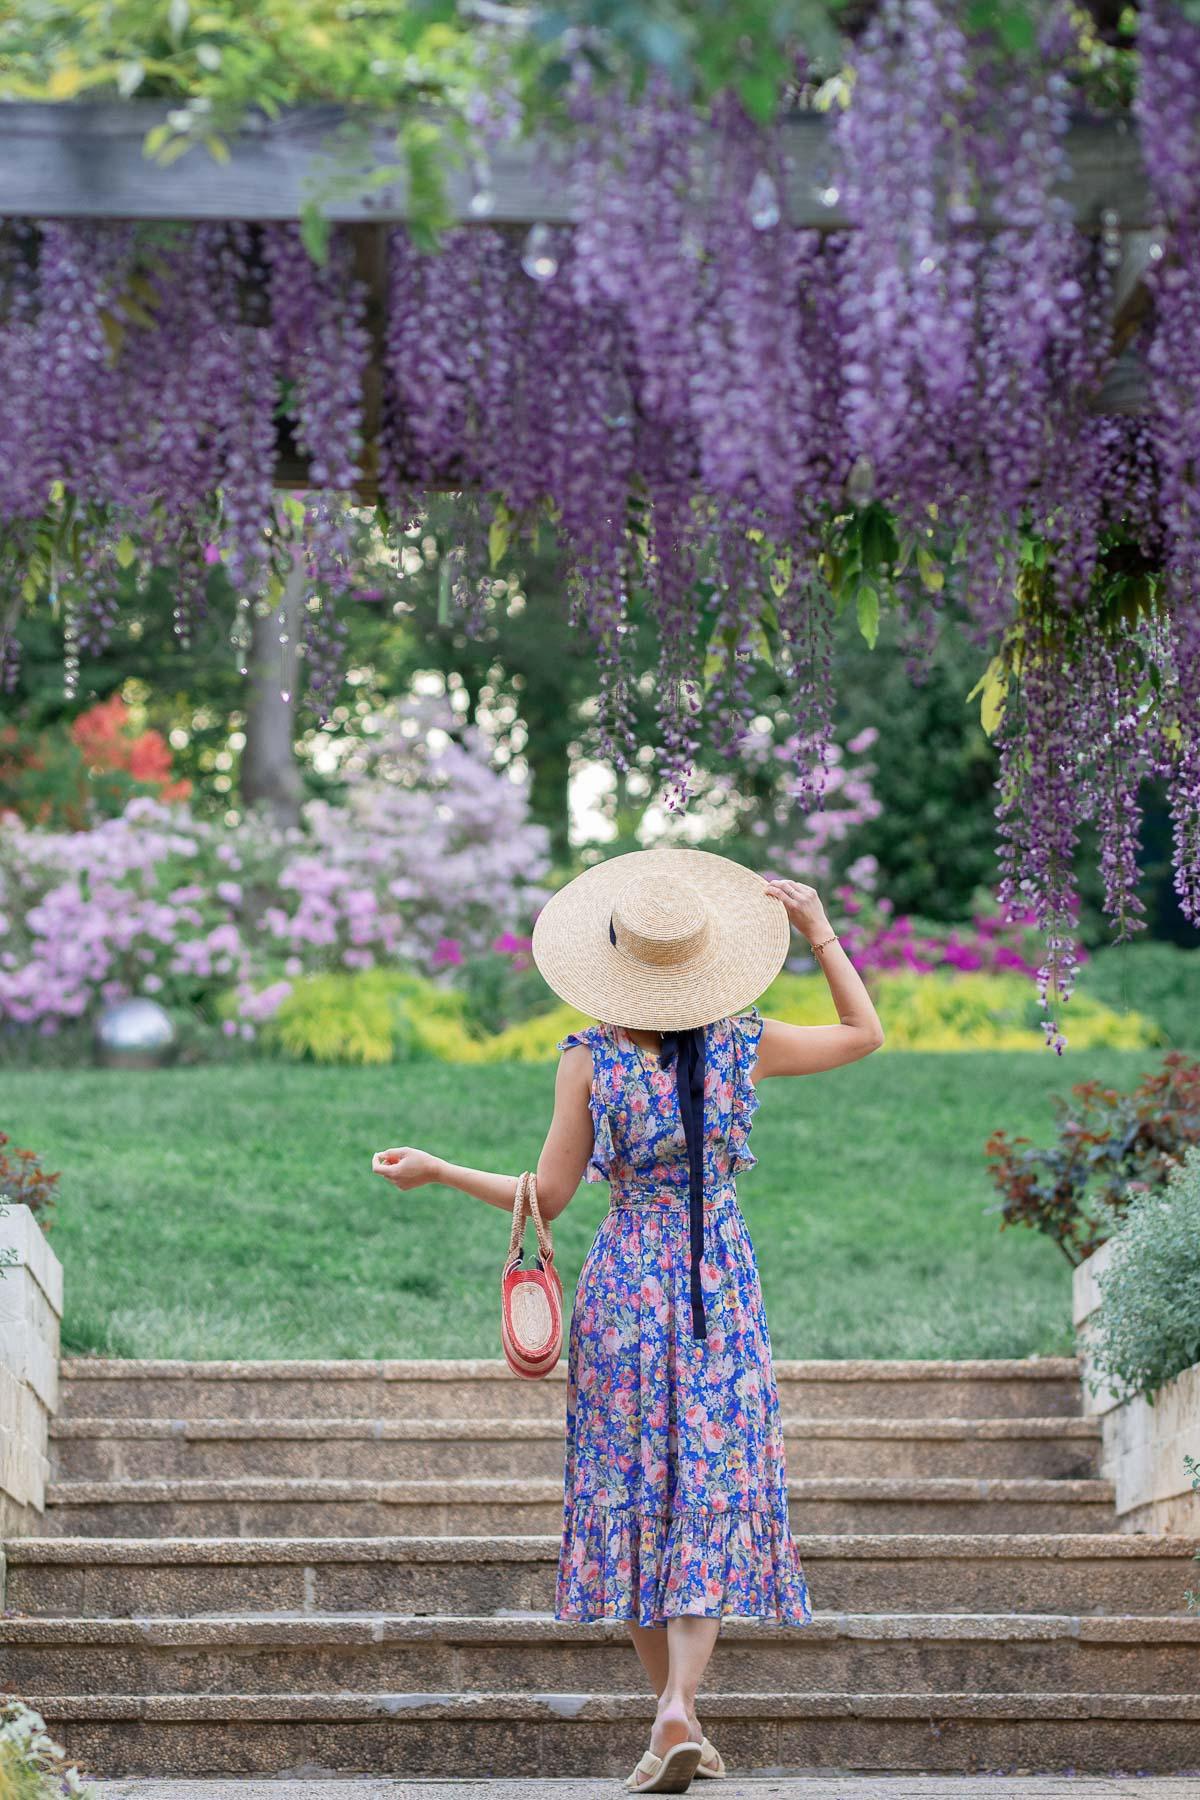 brookside garden wisteria